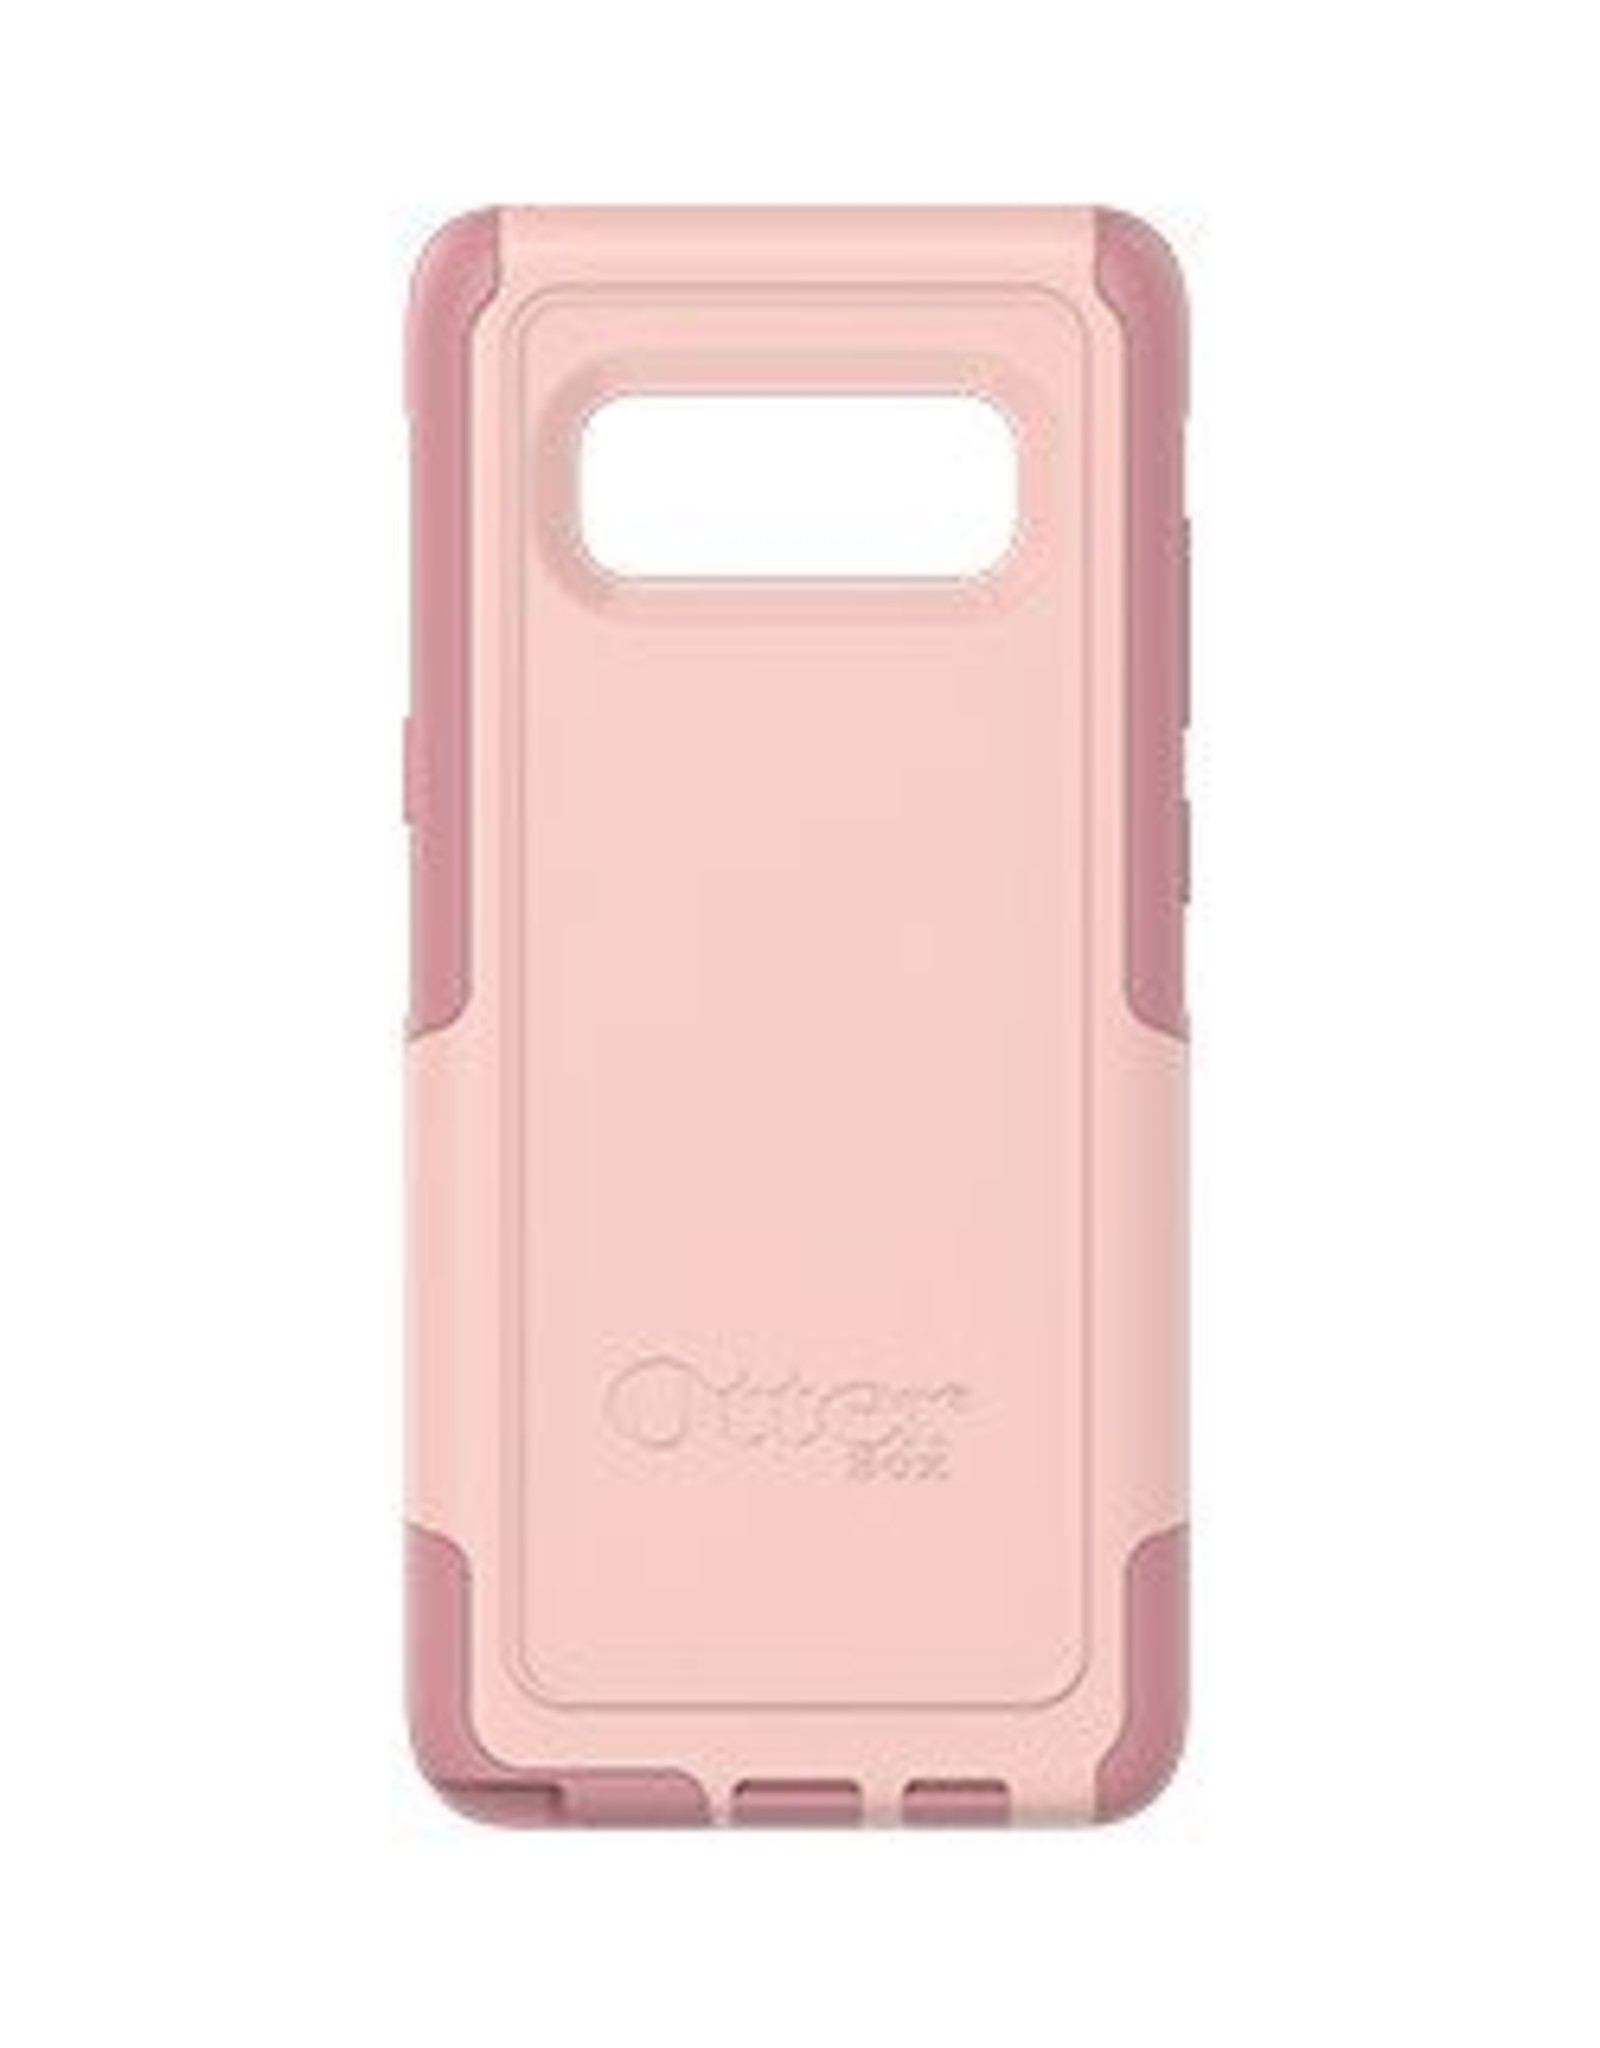 Otterbox OtterBox | Samsung Galaxy Note 8 Commuter Pink | 112-9484